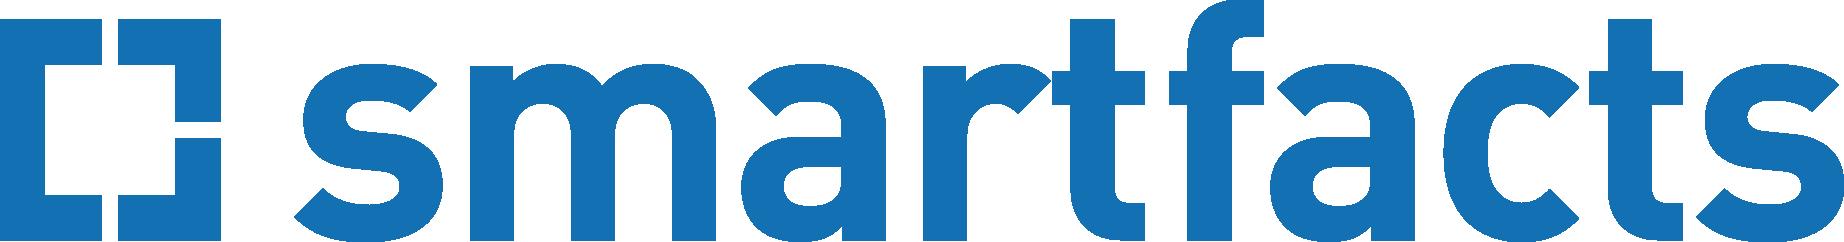 smartfacts-icon-claim-blue